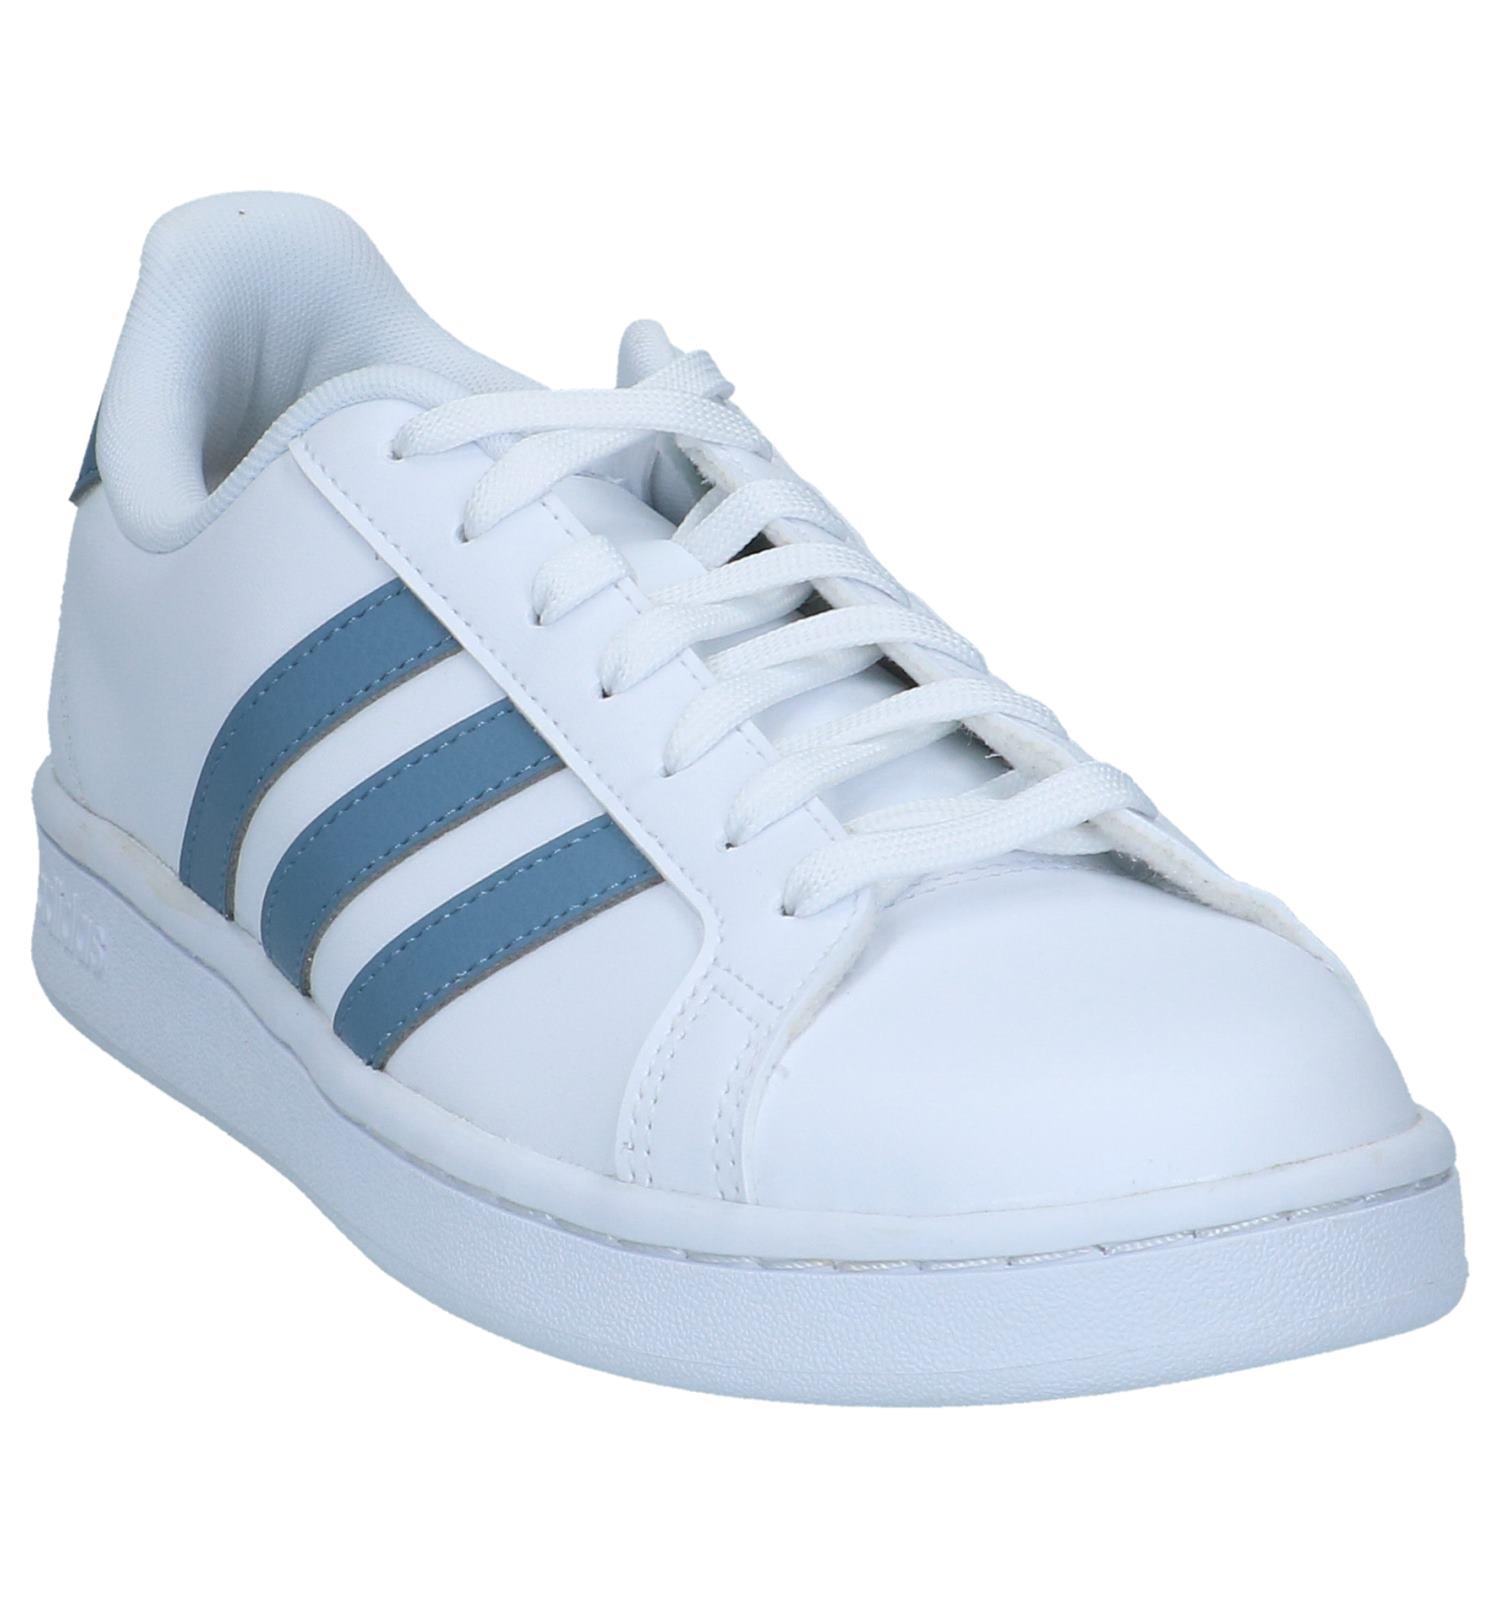 Adidas Court Gratis En Verzend Retour Witte Sneakers Grand Torfs be 7wpHxPq